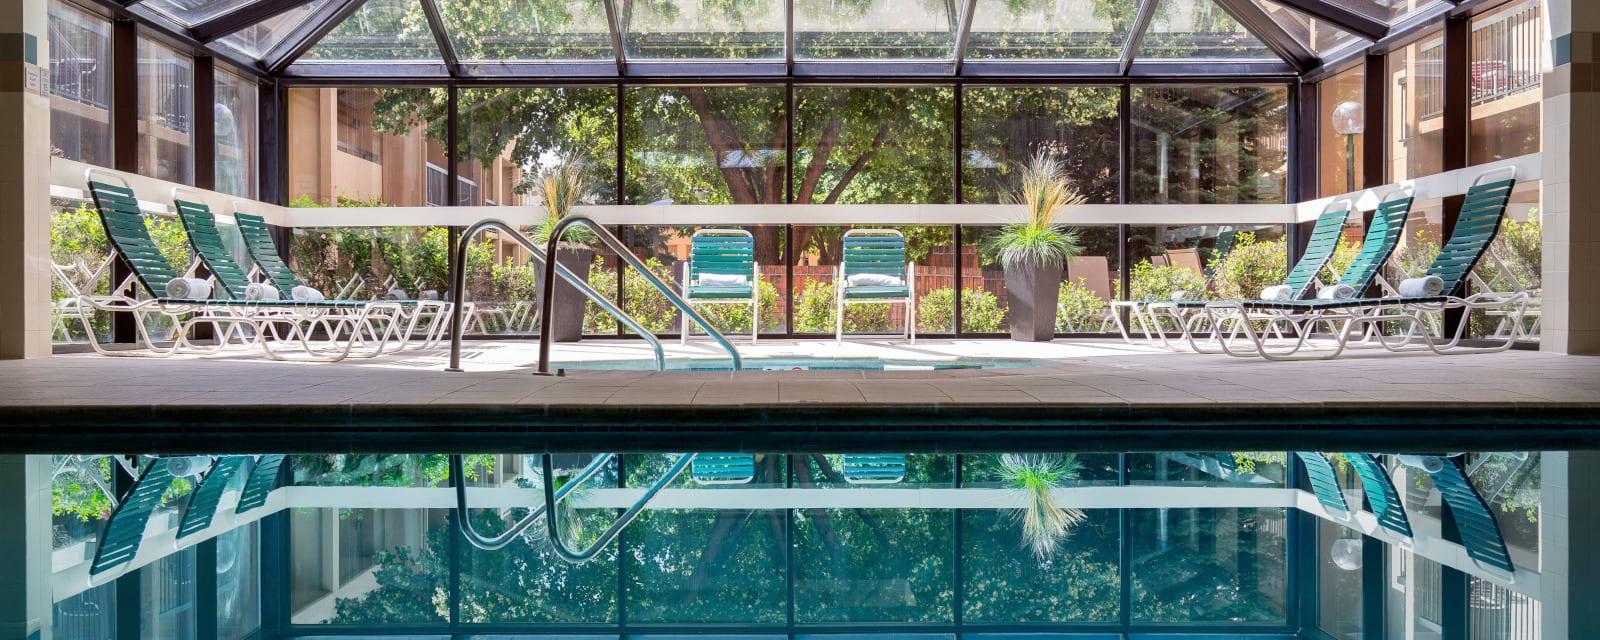 Courtyard by Marriott Denver Stapleton Indoor Swimming Pool